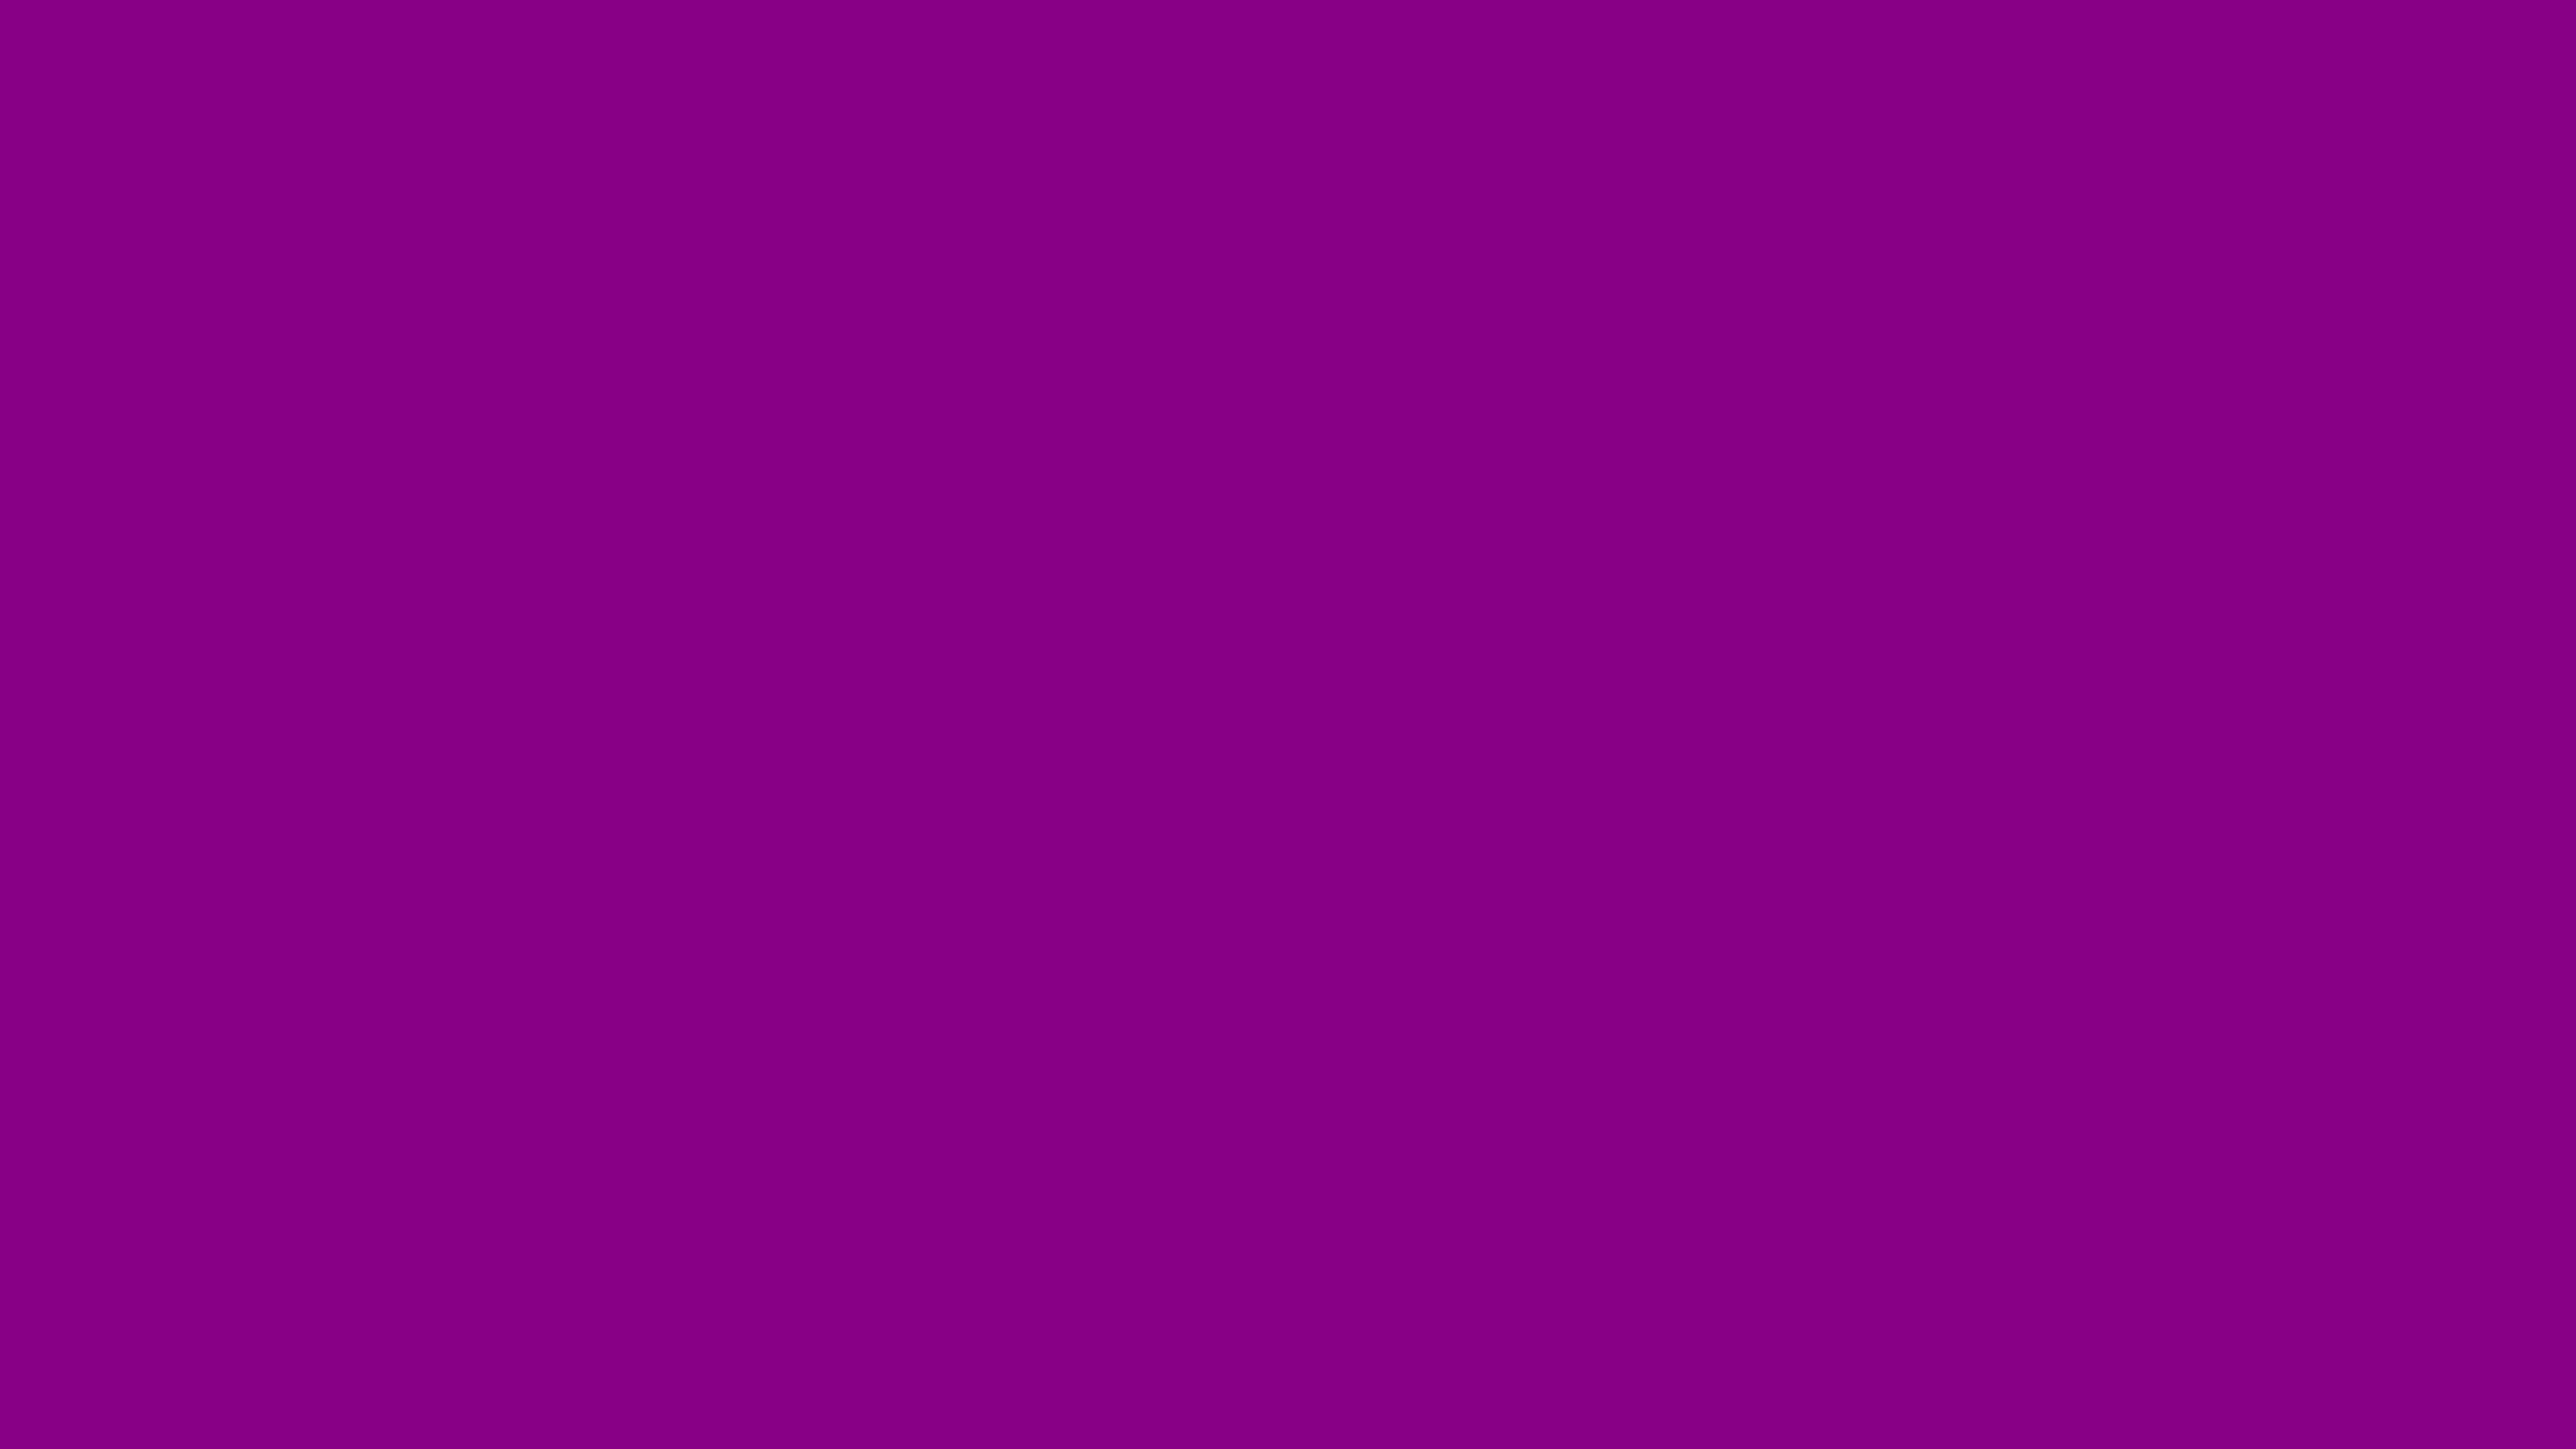 5120x2880 Mardi Gras Solid Color Background